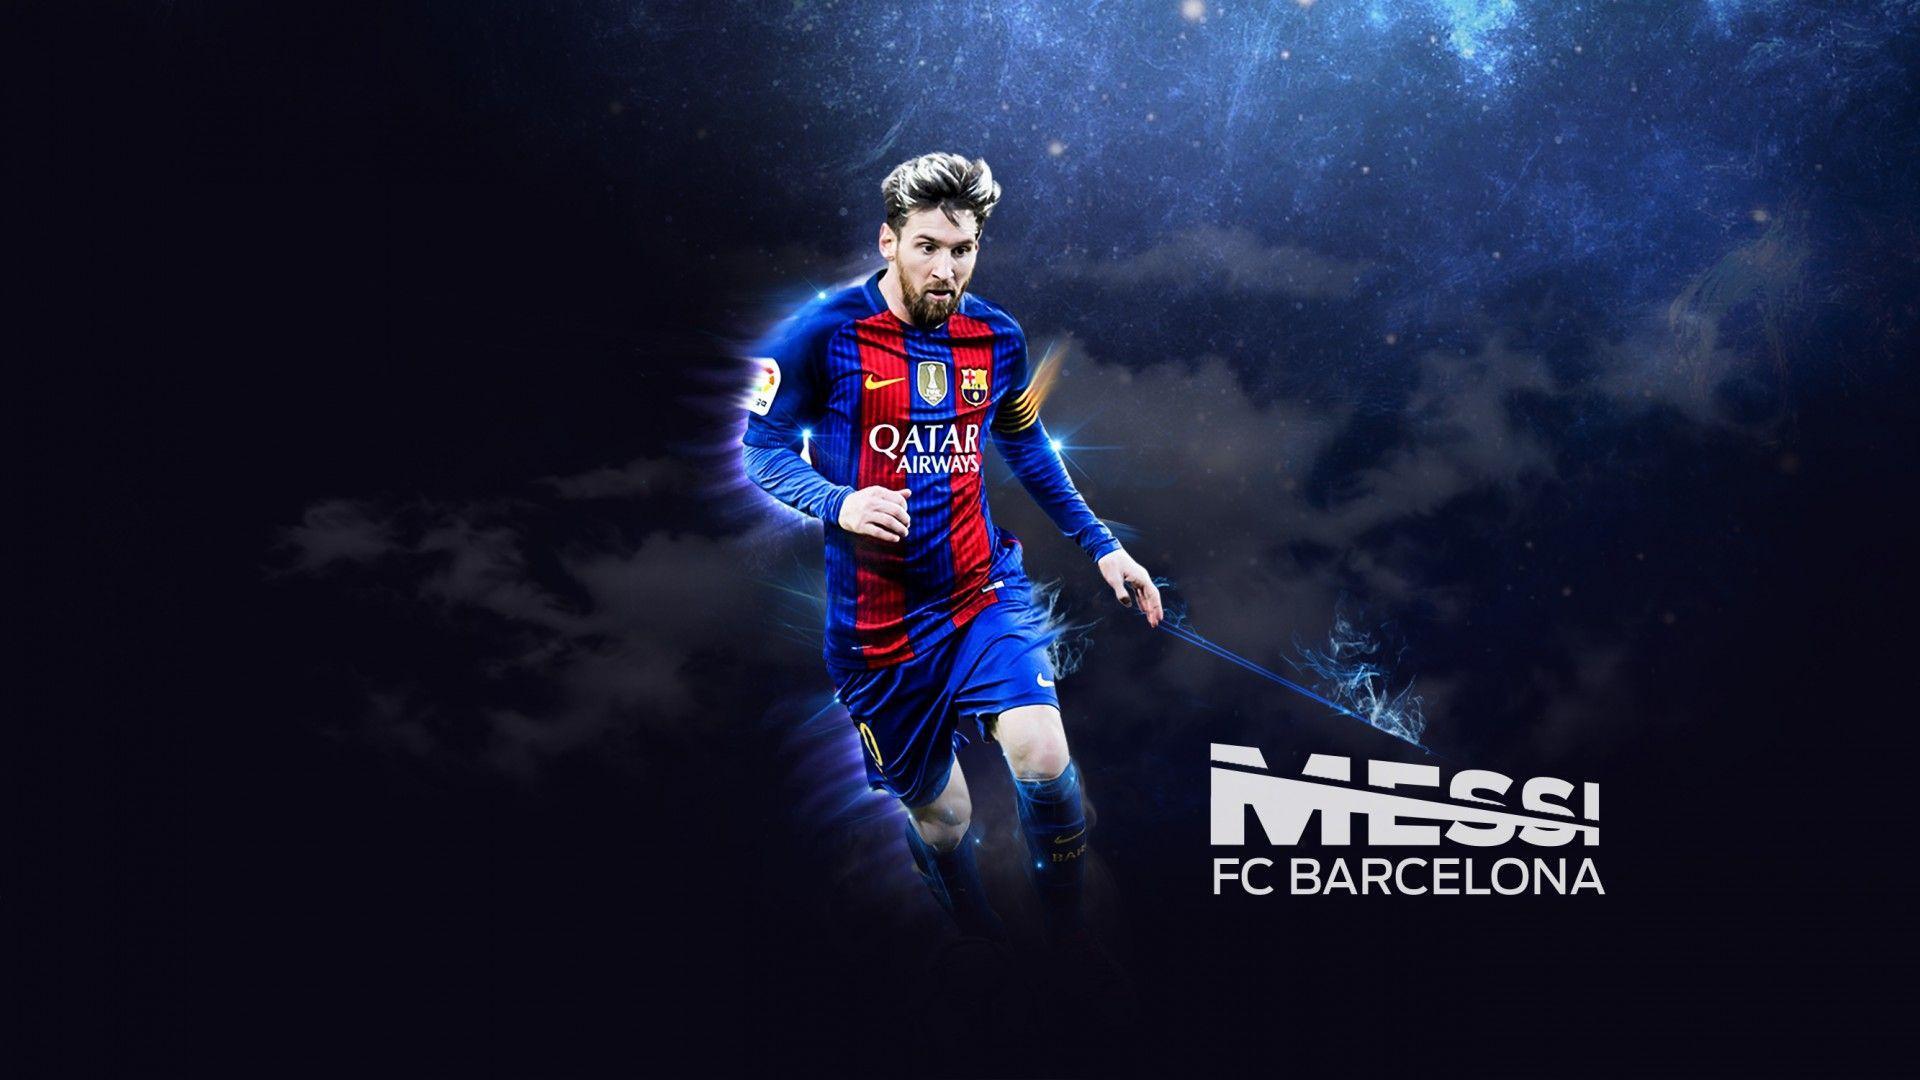 Lionel Messi FC Barcelona Footballer Wallpapers